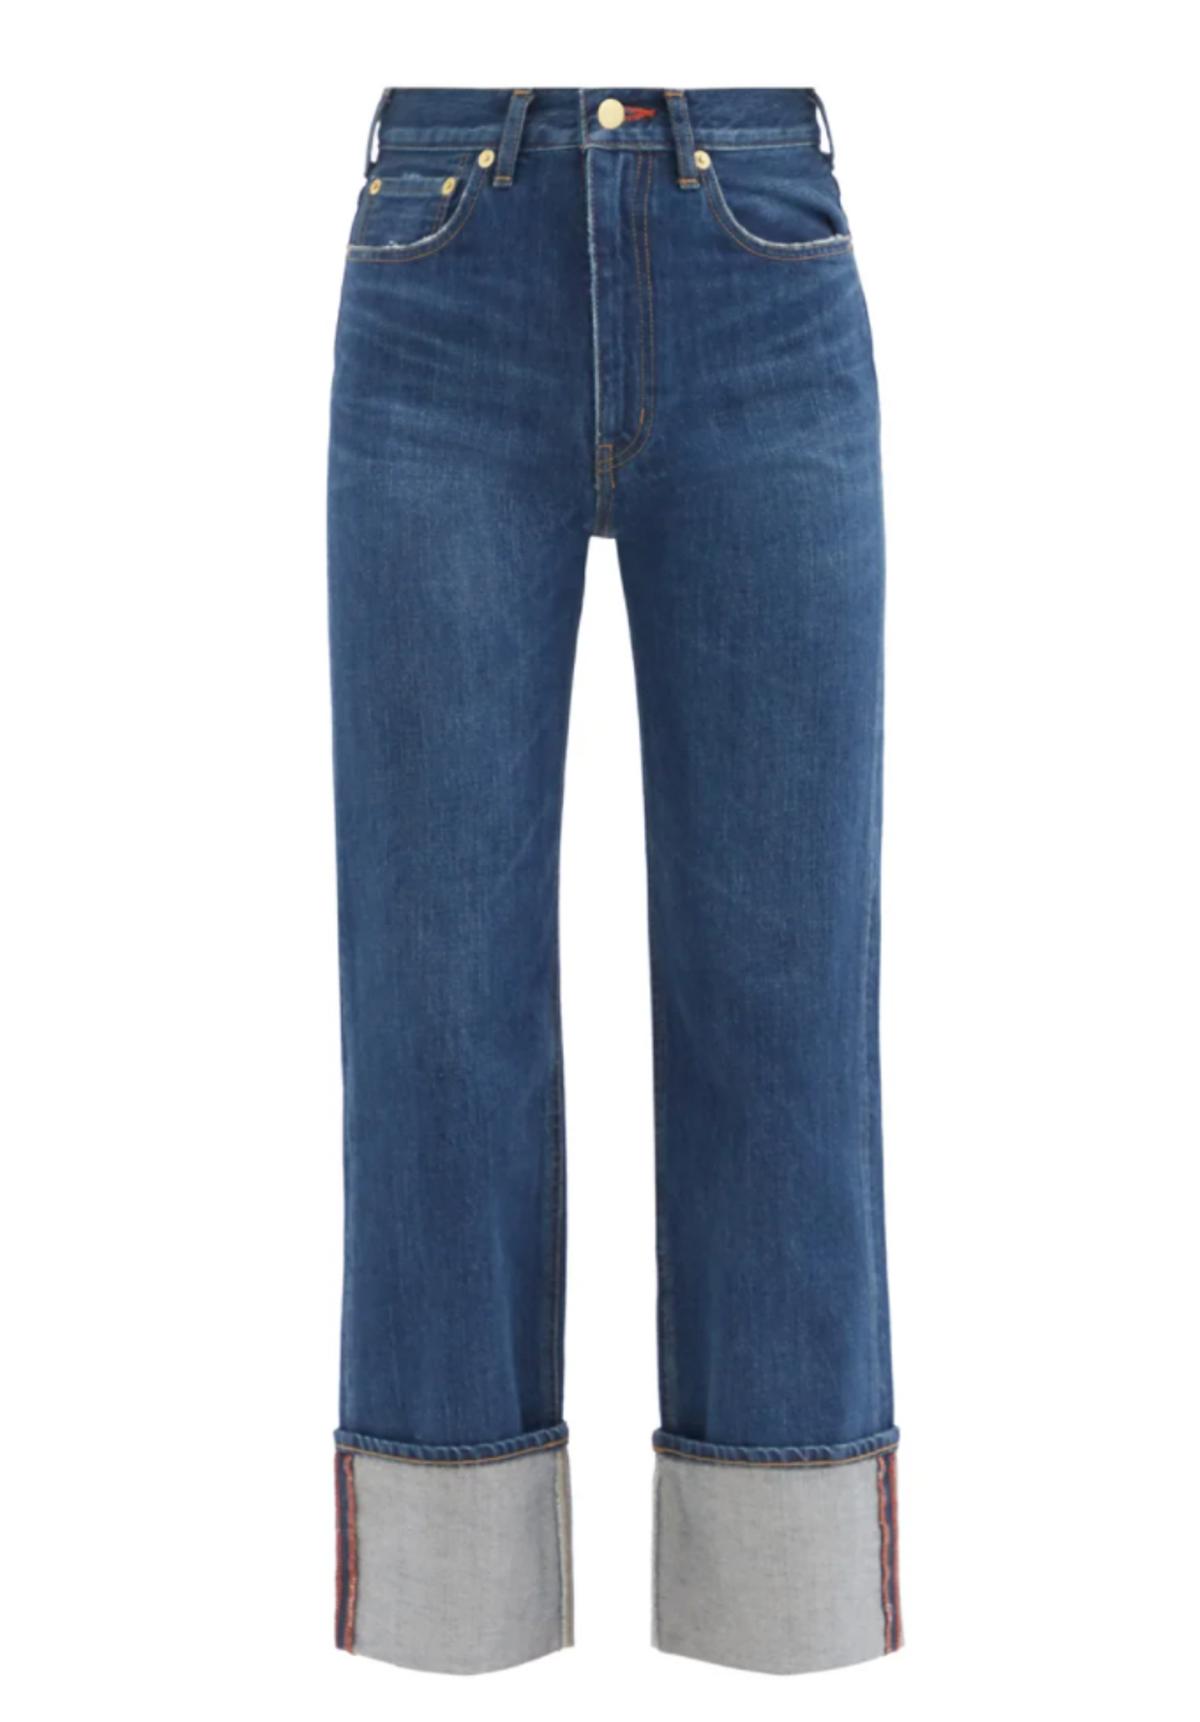 tu es mon tresor carnelian high rise turn up jeans